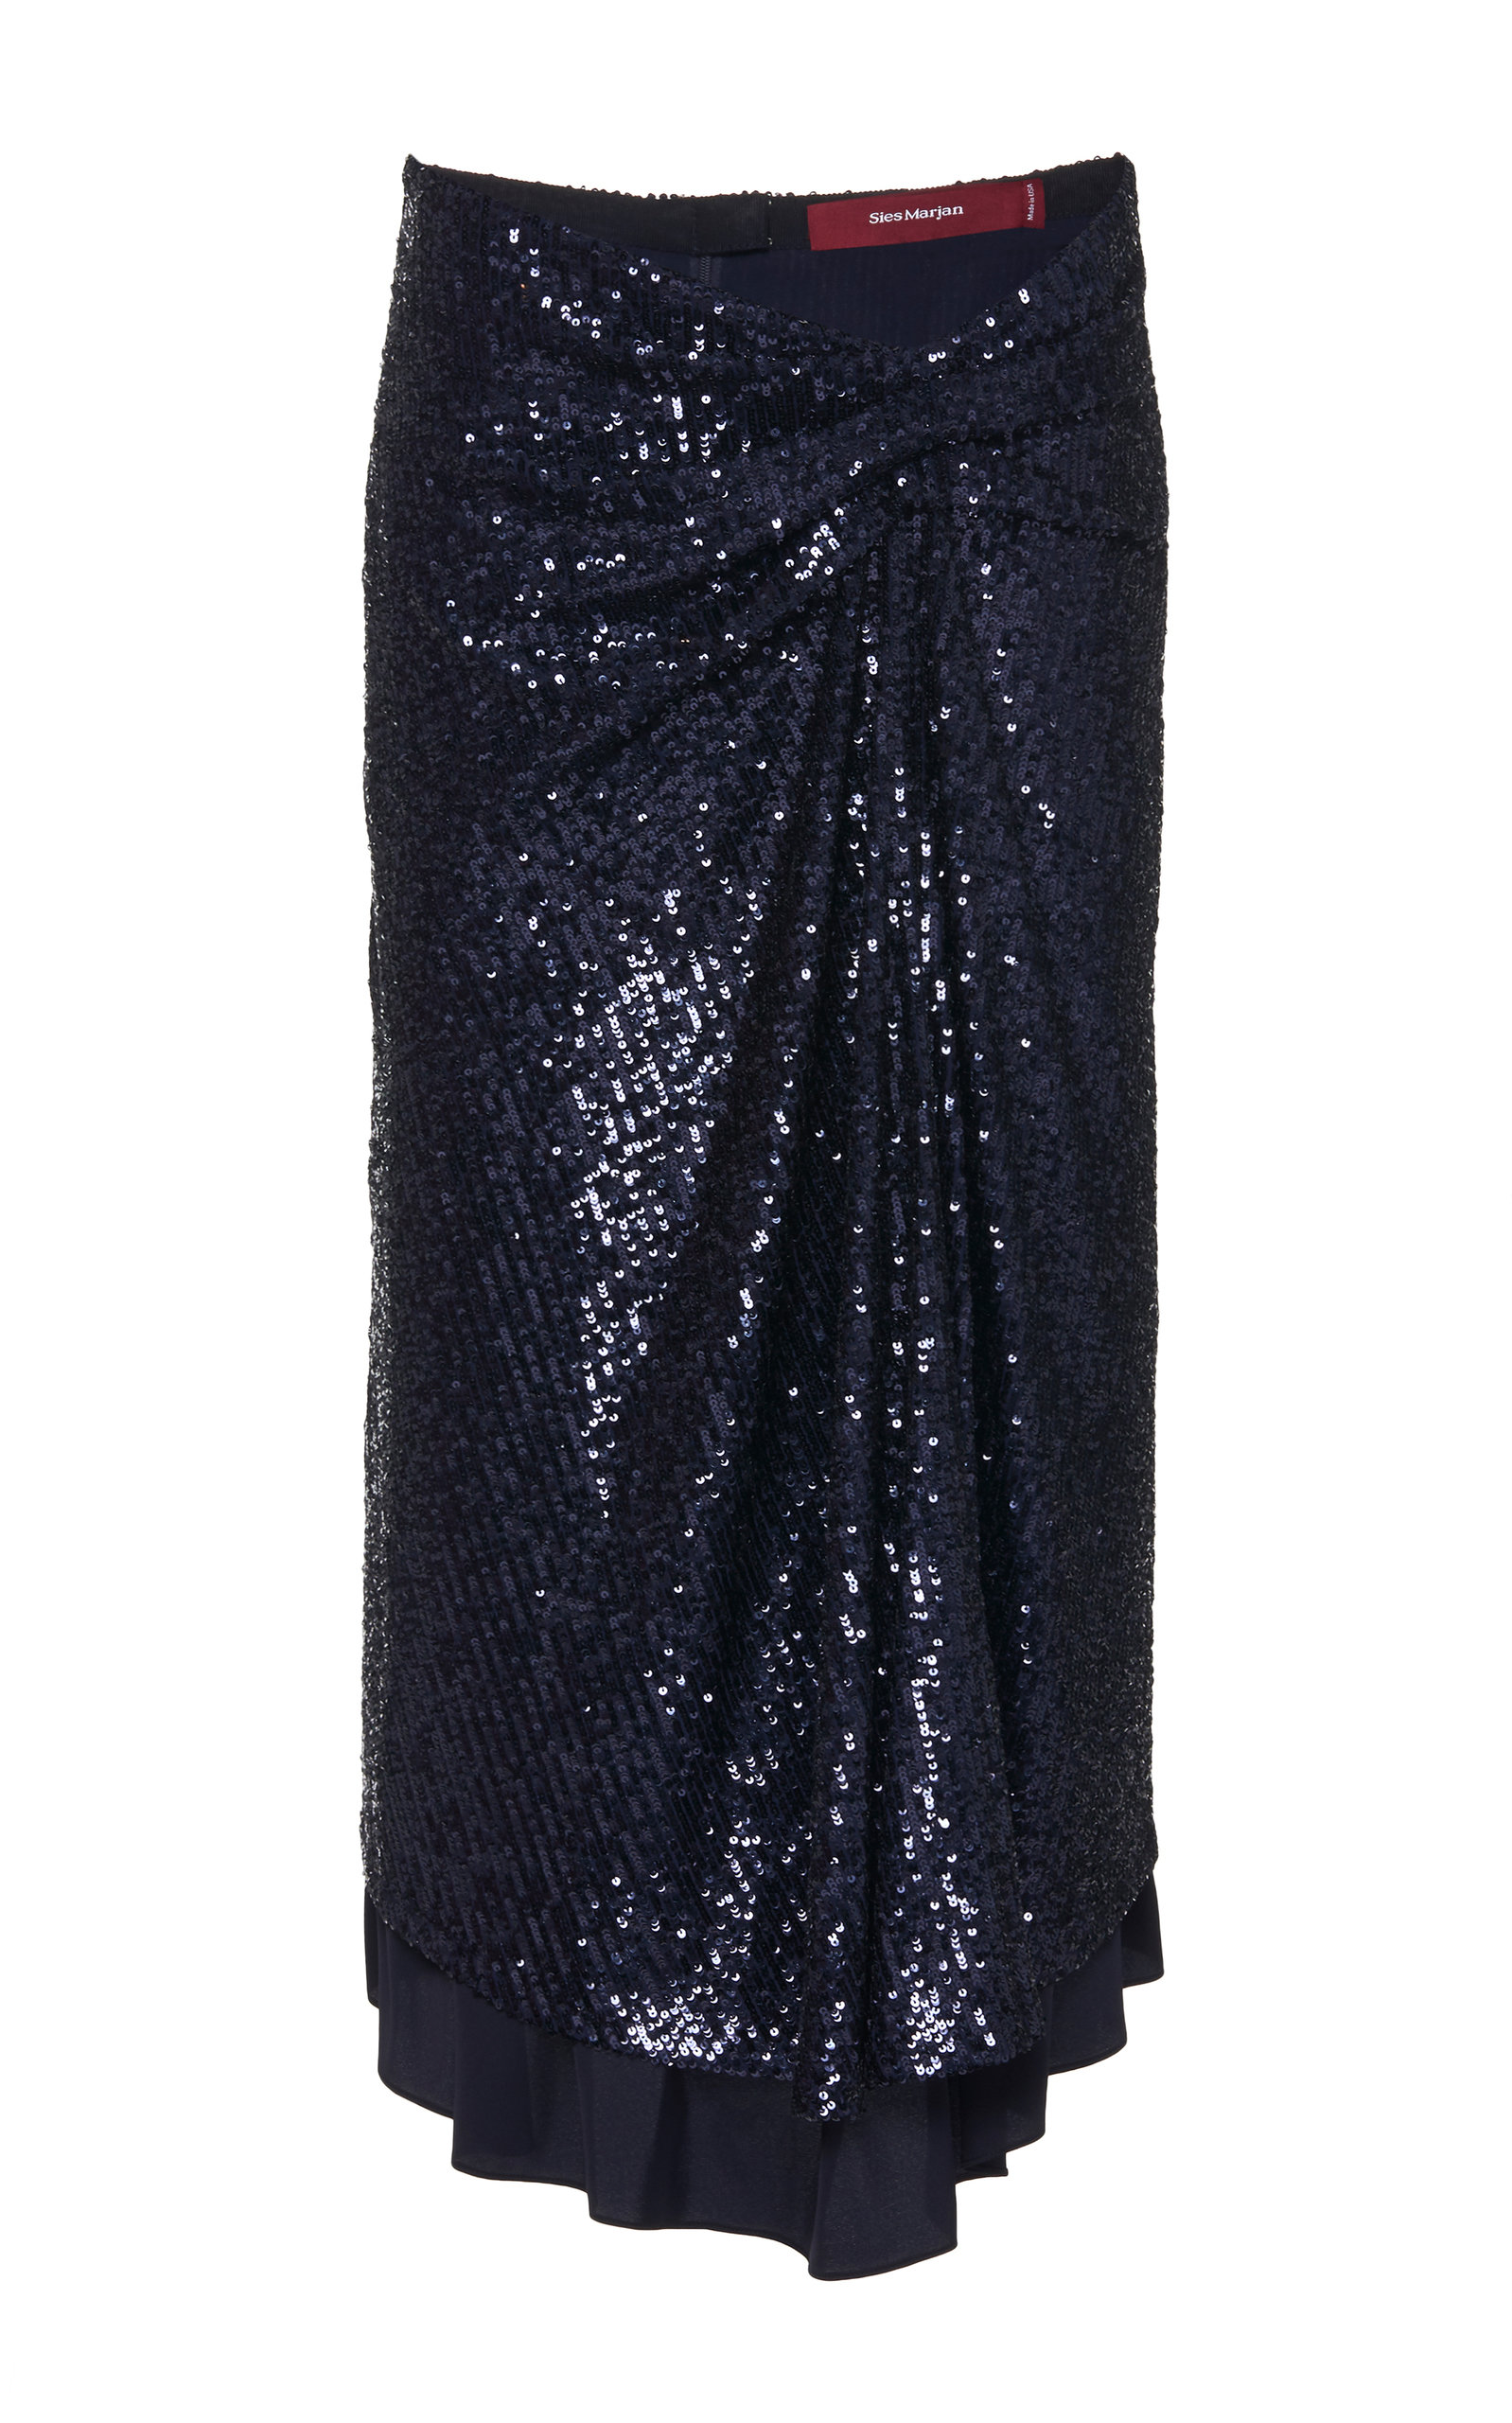 Sies Marjan Skirts Kayla Draped Sequin Midi Skirt